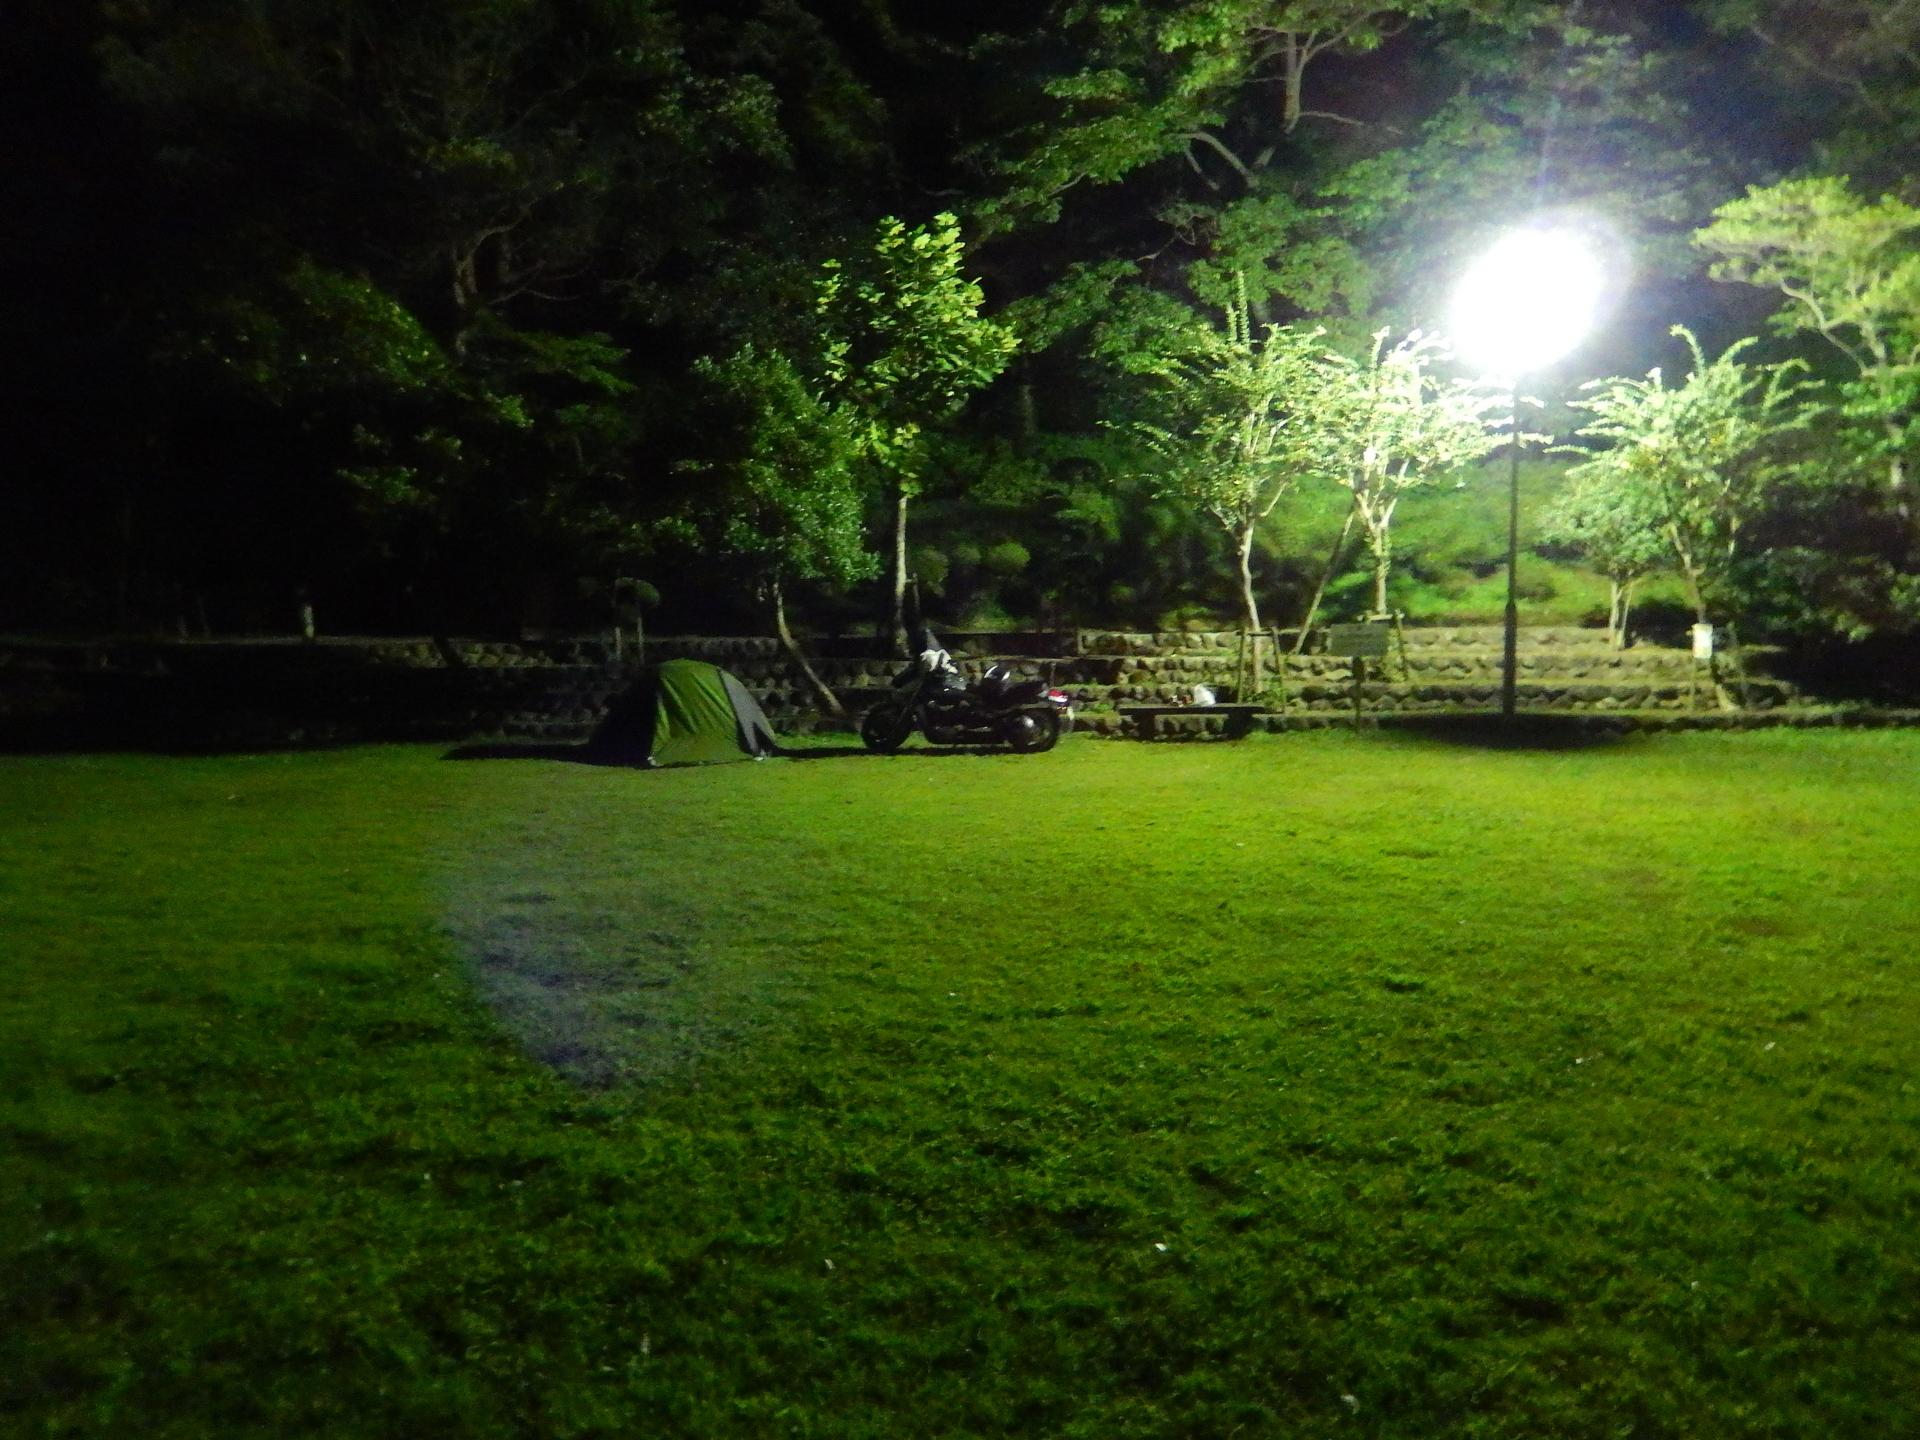 f:id:ToshUeno:20140926214713j:plain